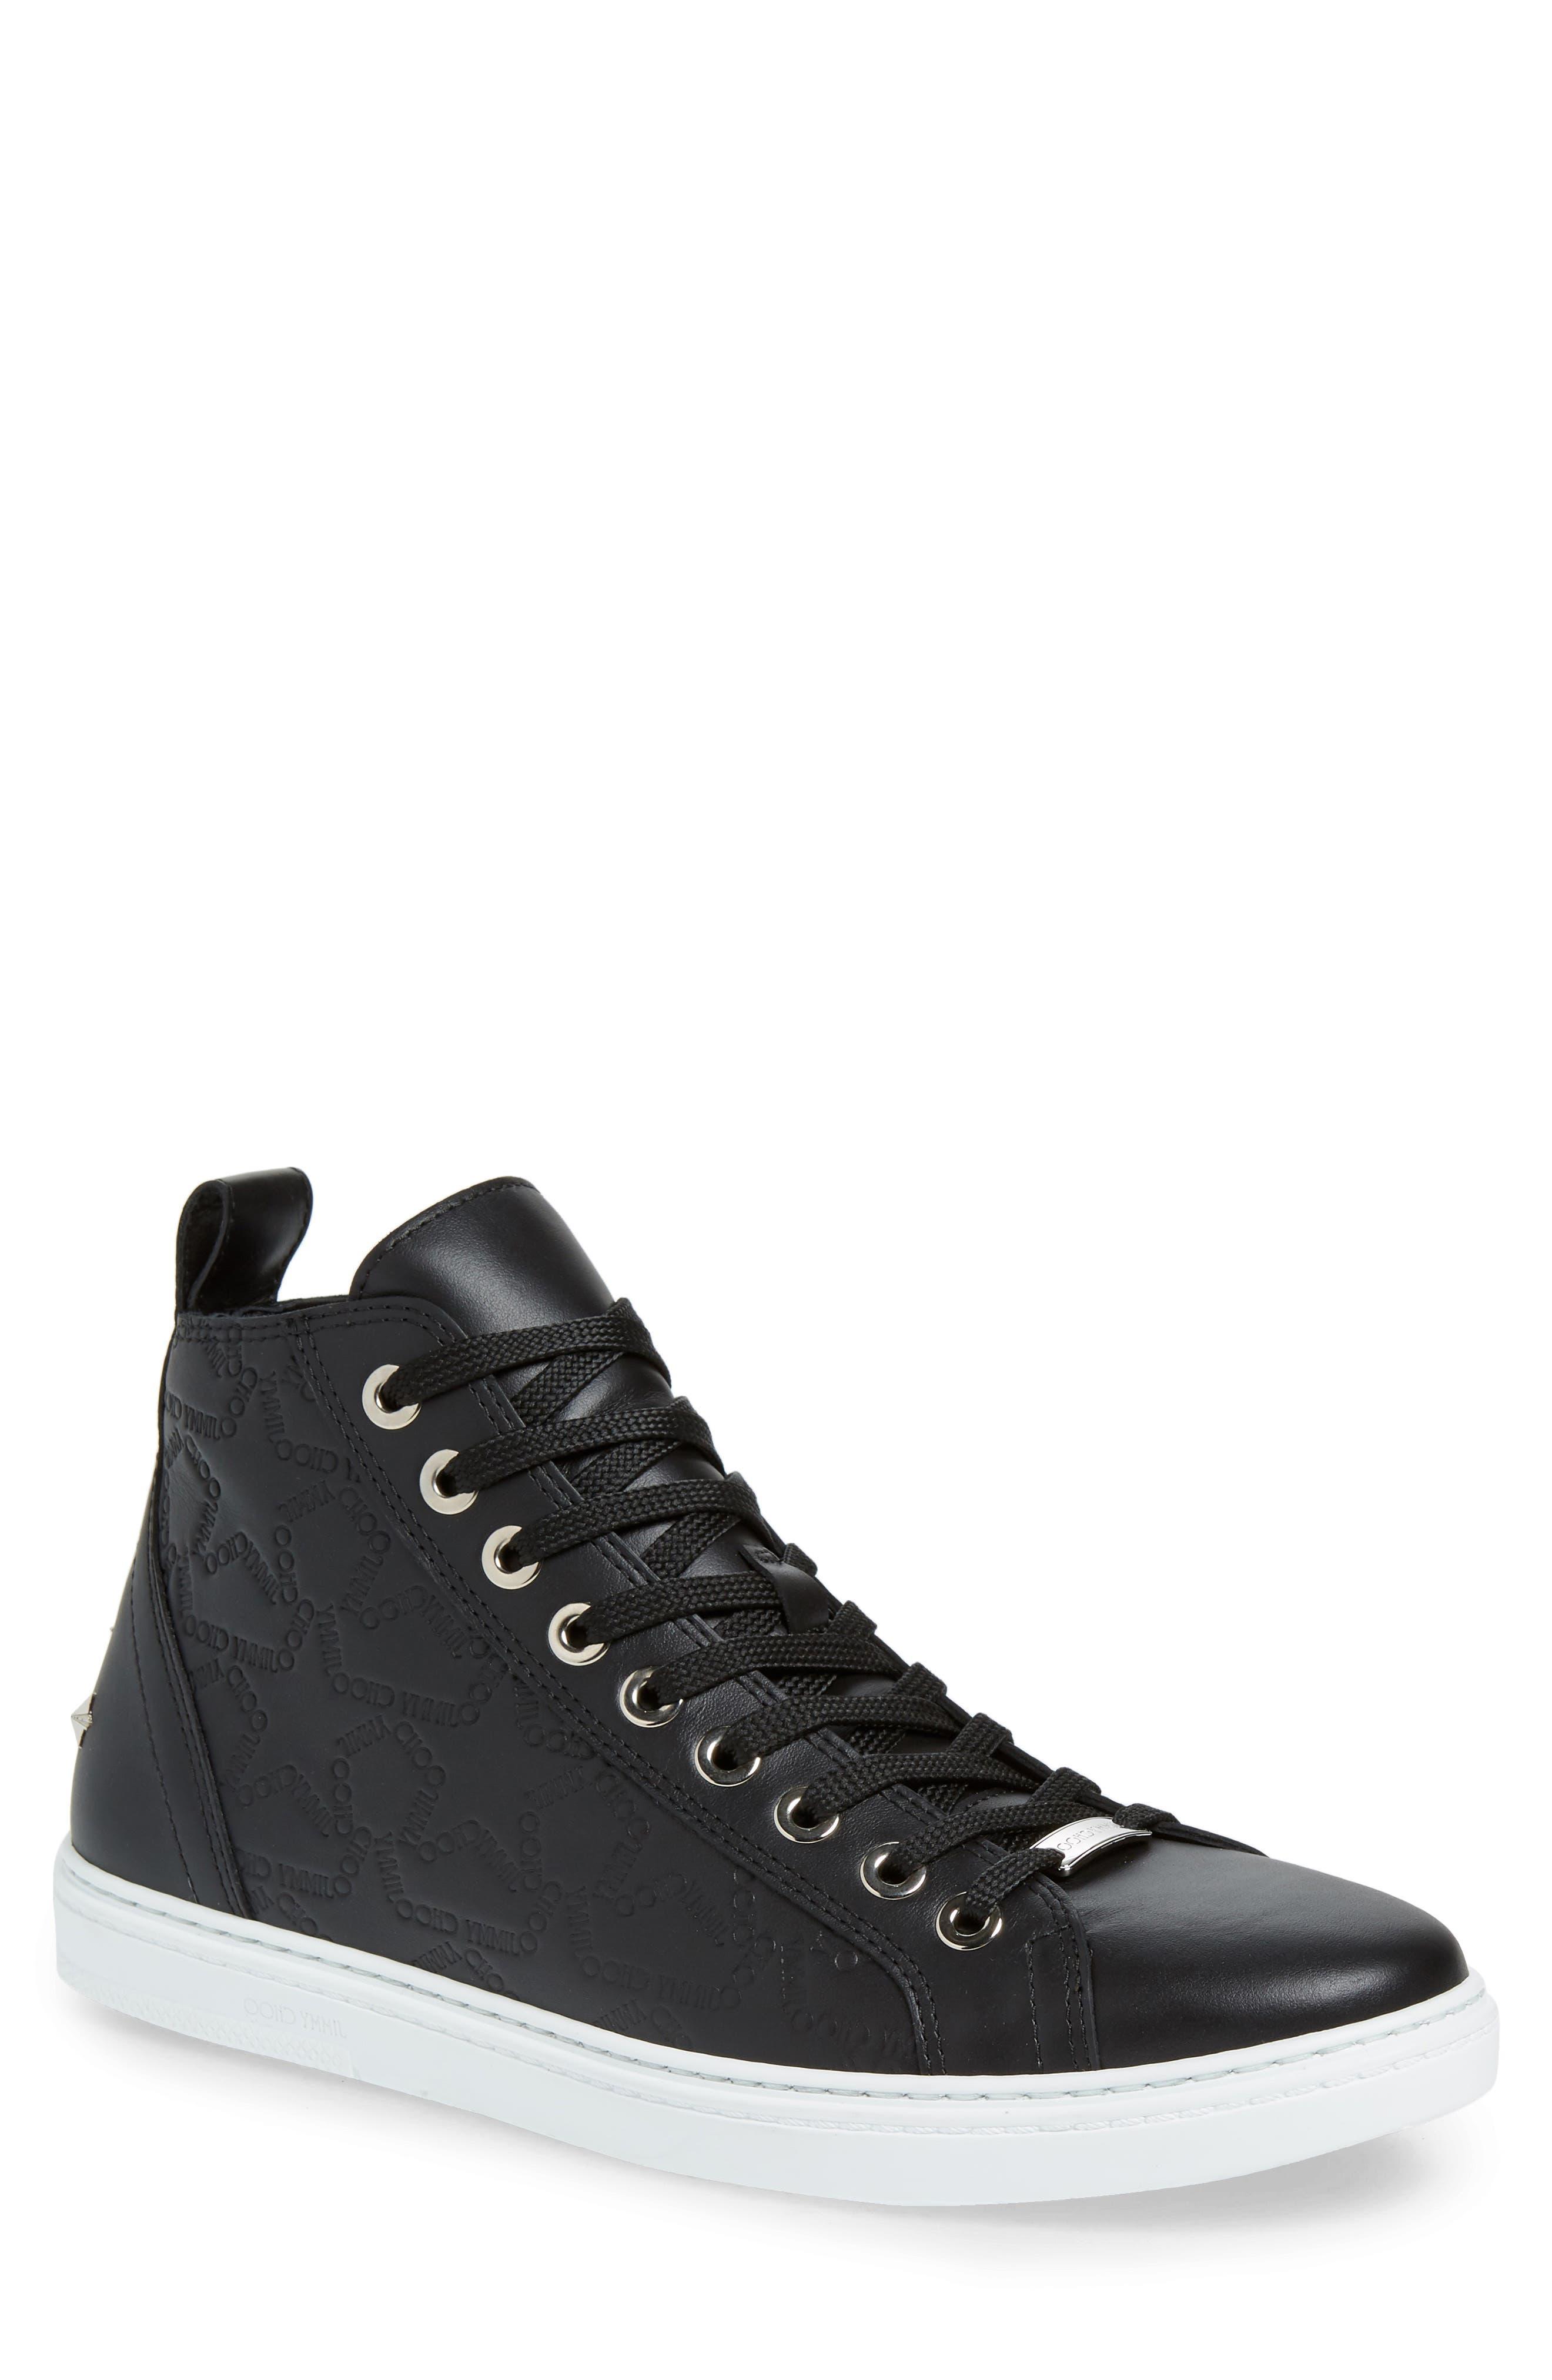 JIMMY CHOO Colt High Top Sneaker, Main, color, BLACK